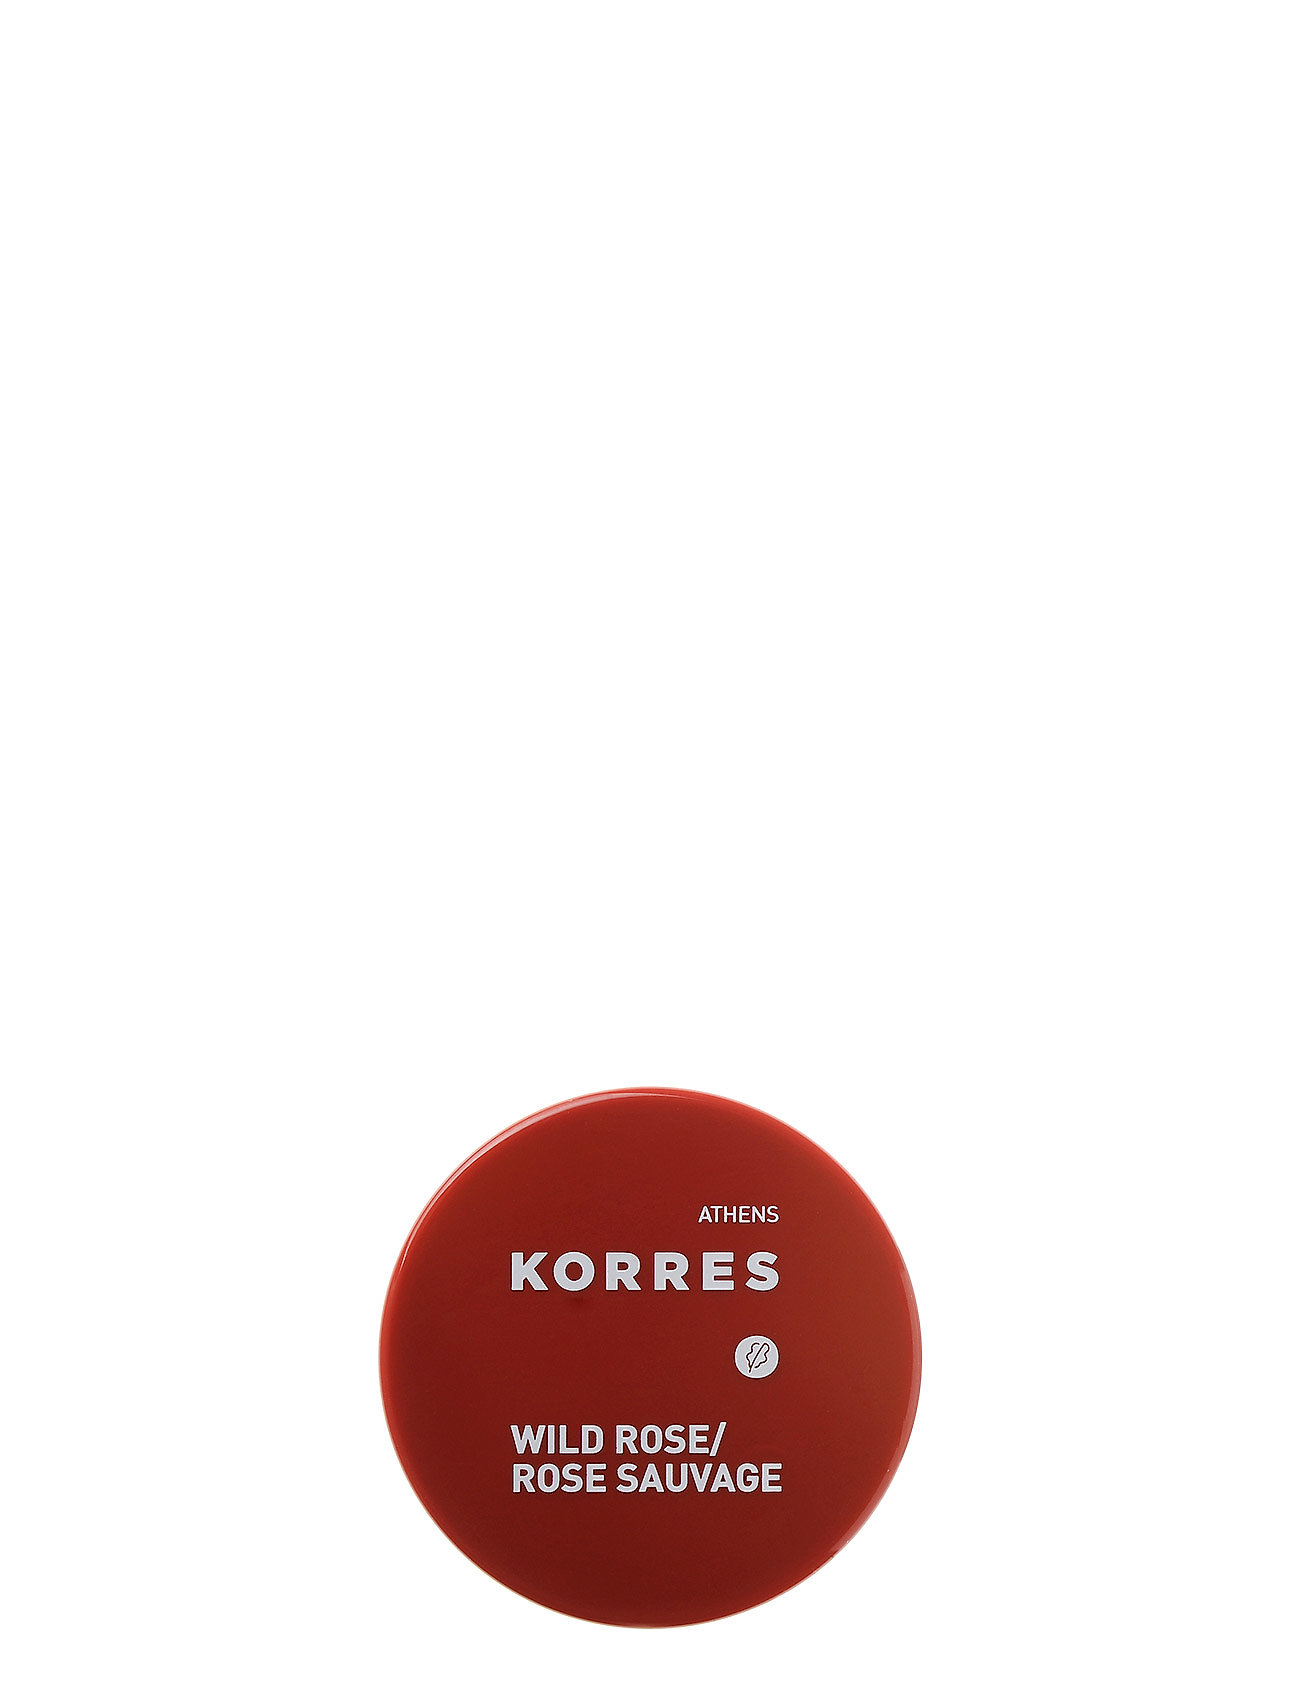 korres Wild rose lip butter på boozt.com dk